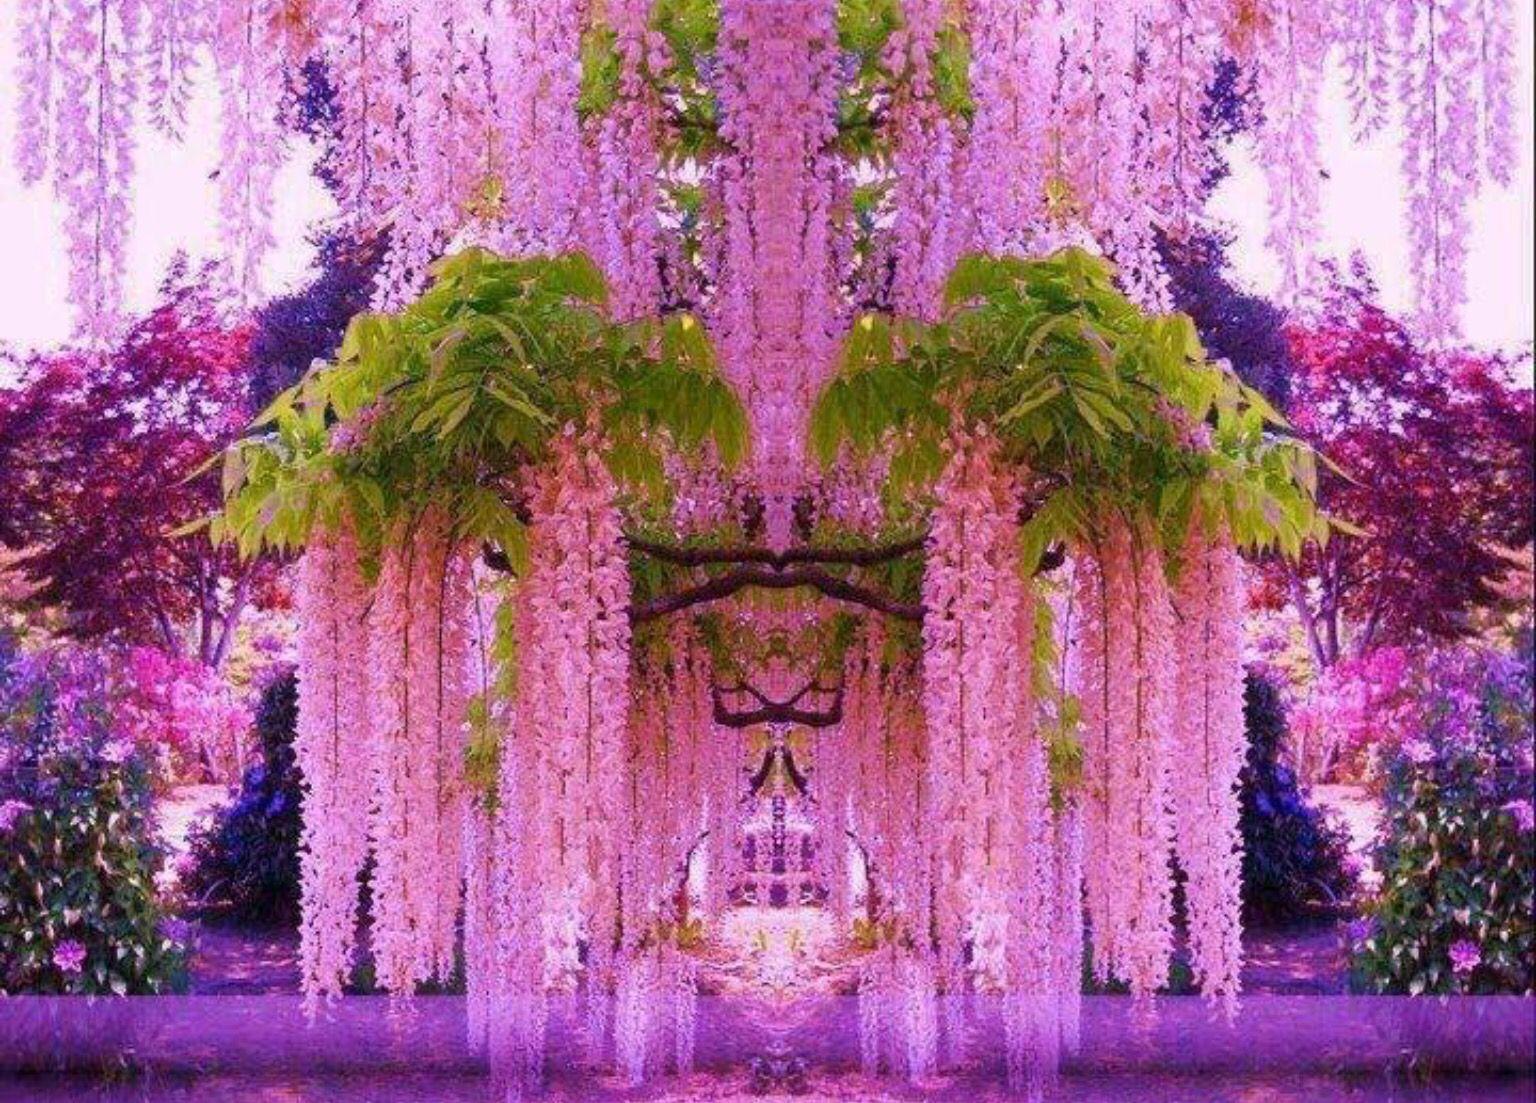 Purple Wisteria Tokyo Japan Splendidi Giardini Bellissimi Fiori Idee Immagine